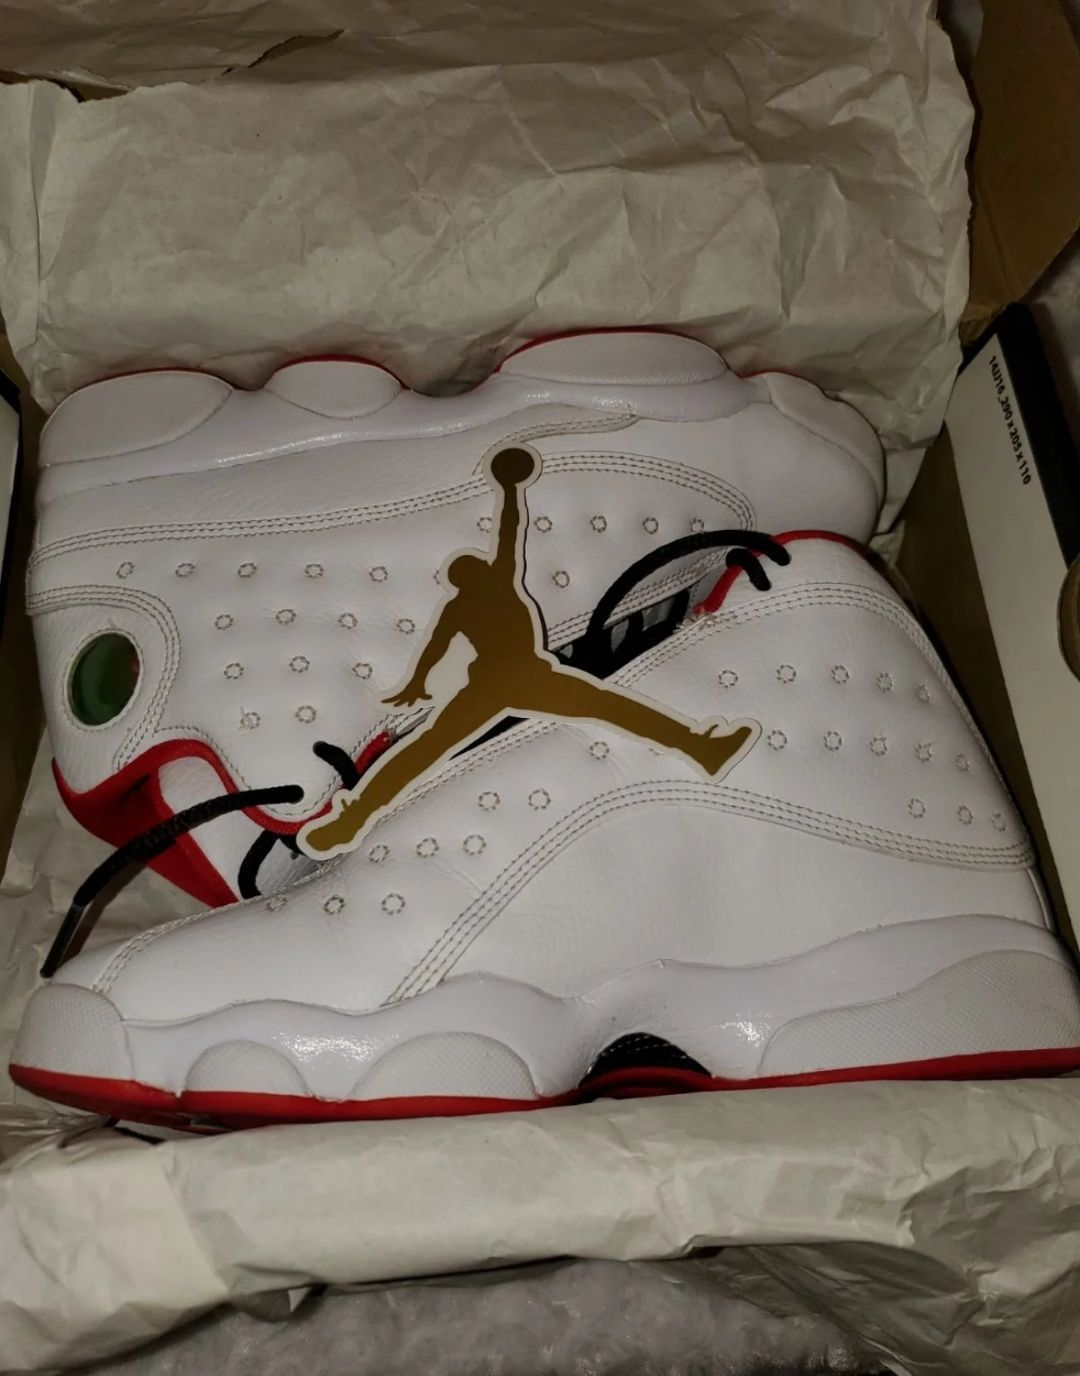 Jordan retro 13 white, Air jordans